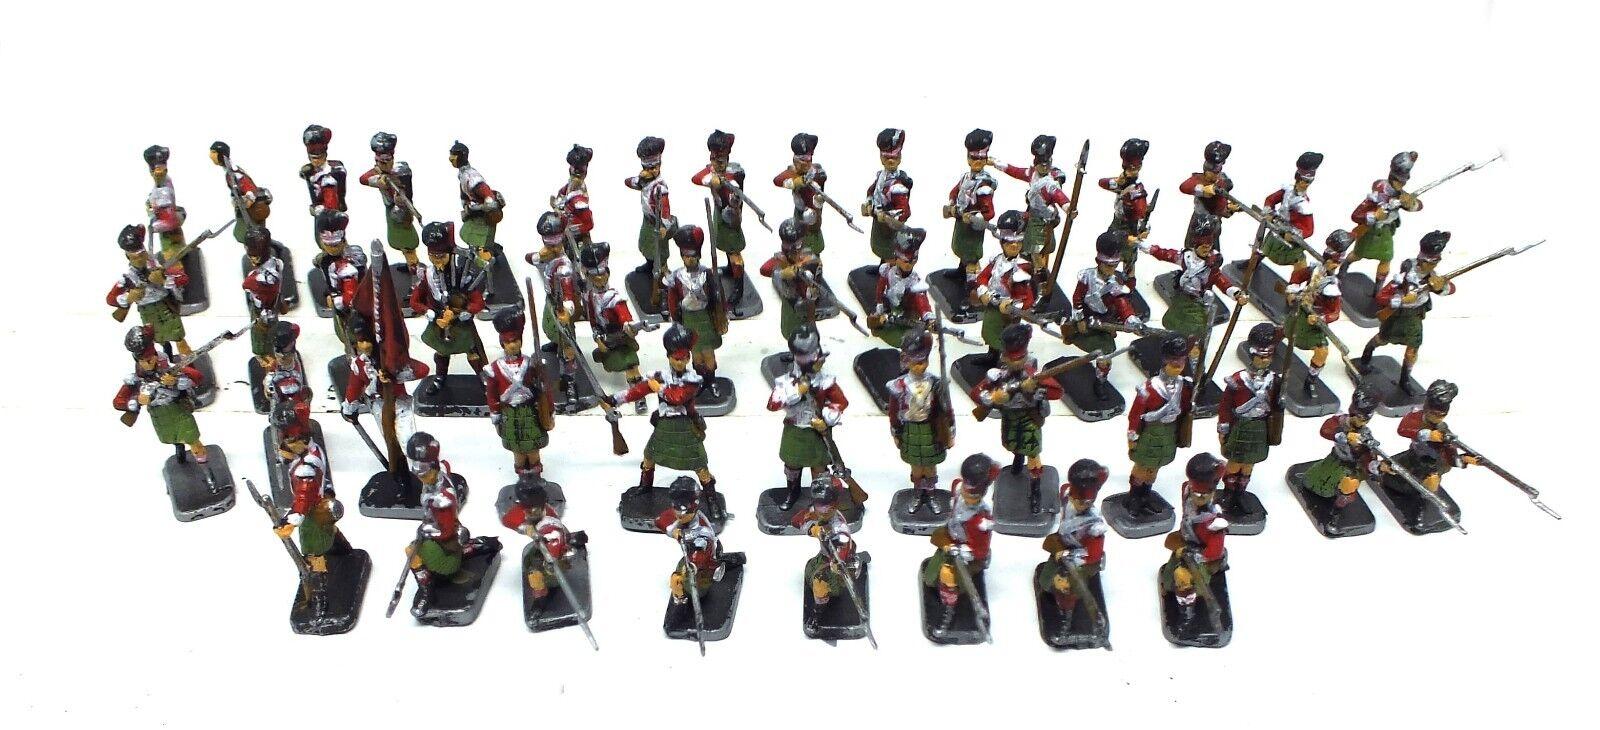 Italeri - Granaderos Highlander Infantry (1815) Painted - SET6004 - 1 72